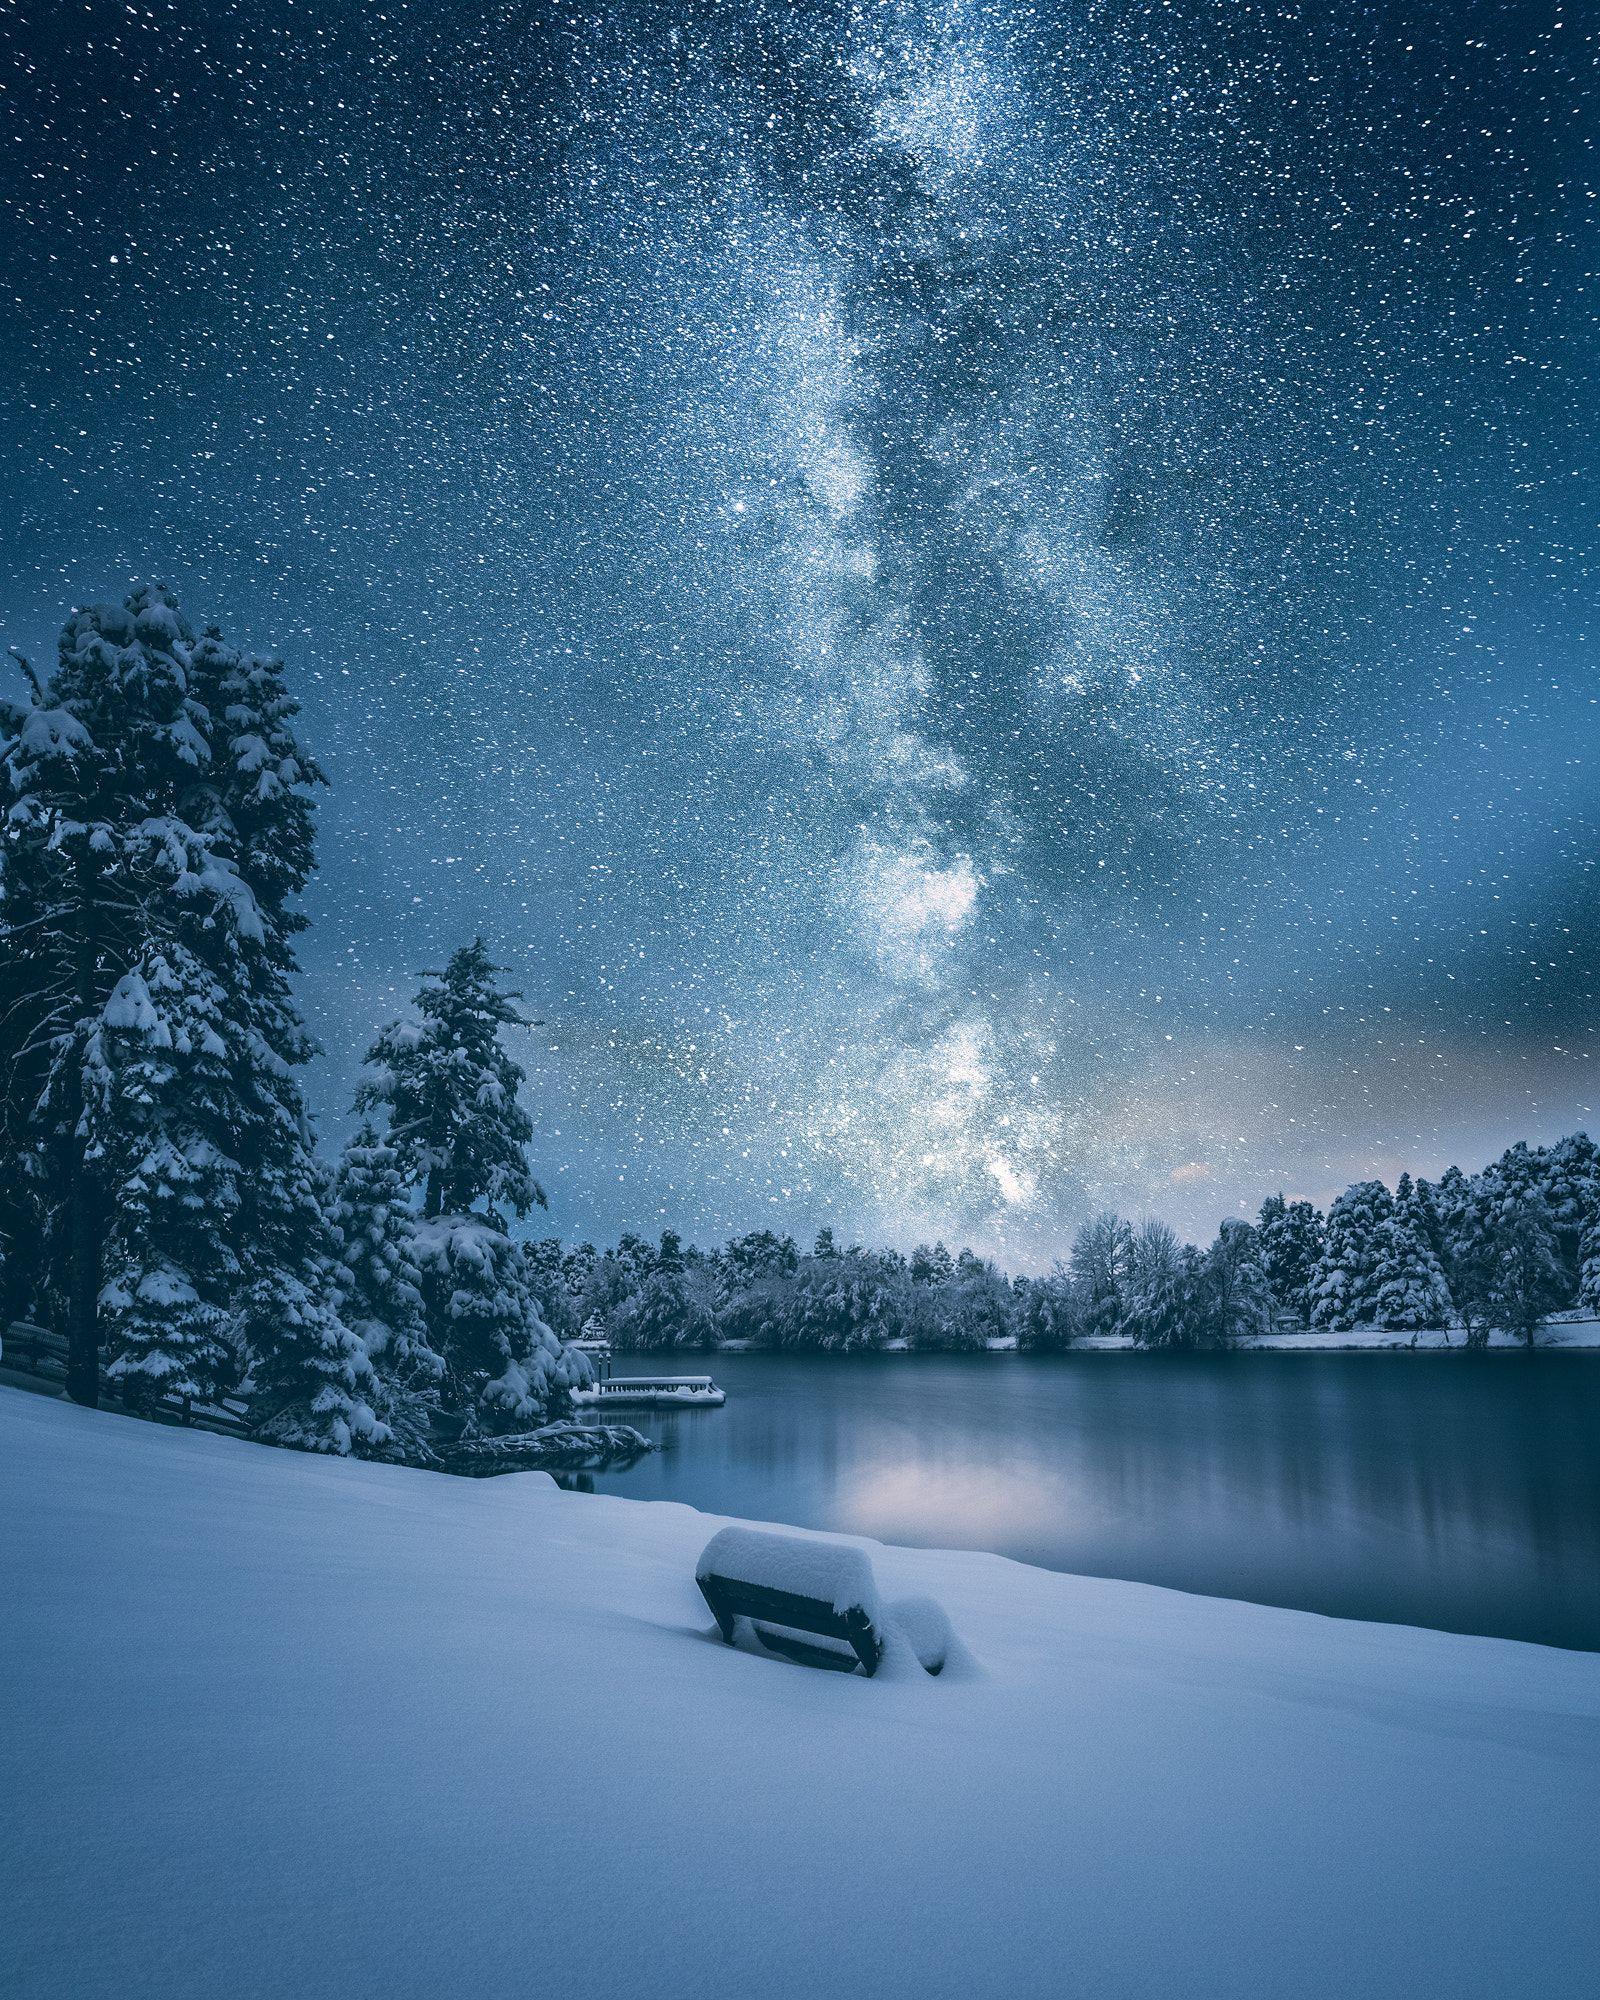 Milky Way By Cuma Cevik On 500px Night Landscape Night Landscape Photography Winter Landscape